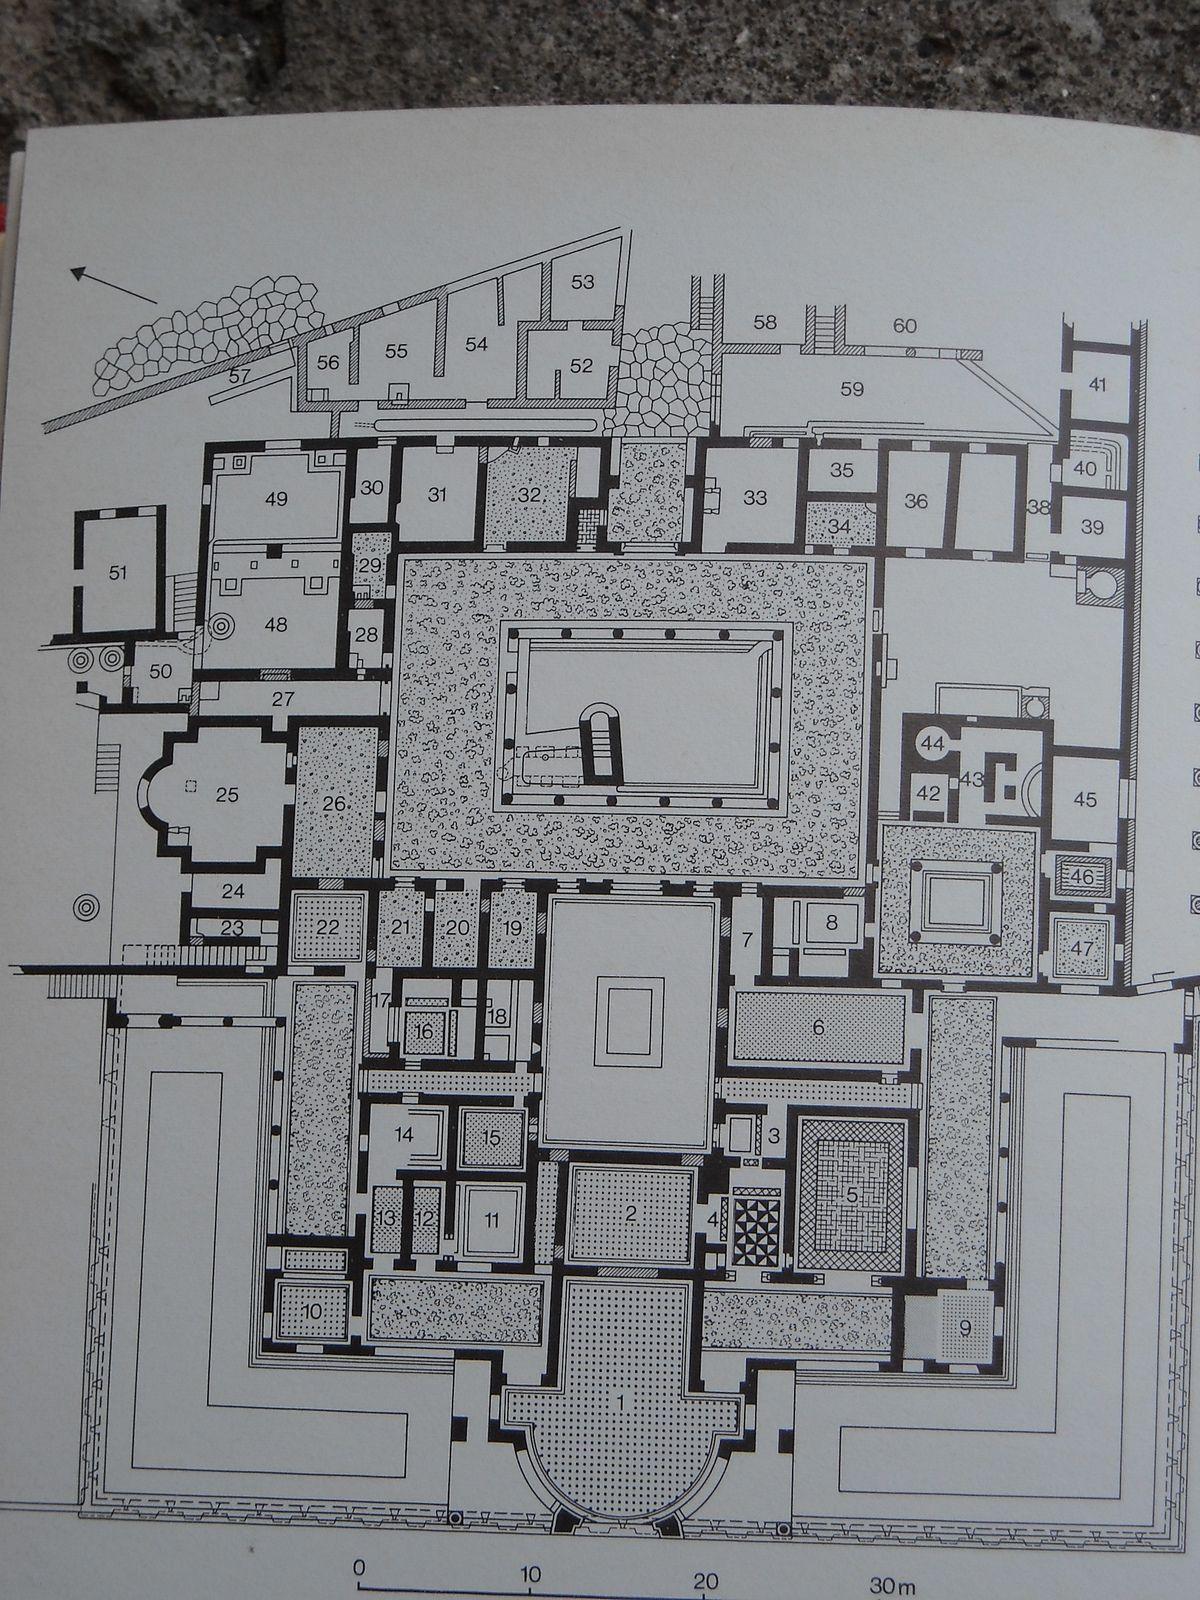 Plan Of The Villa Of The Mysteries At Pompeii Roman Villa Ancient Roman Houses Roman House